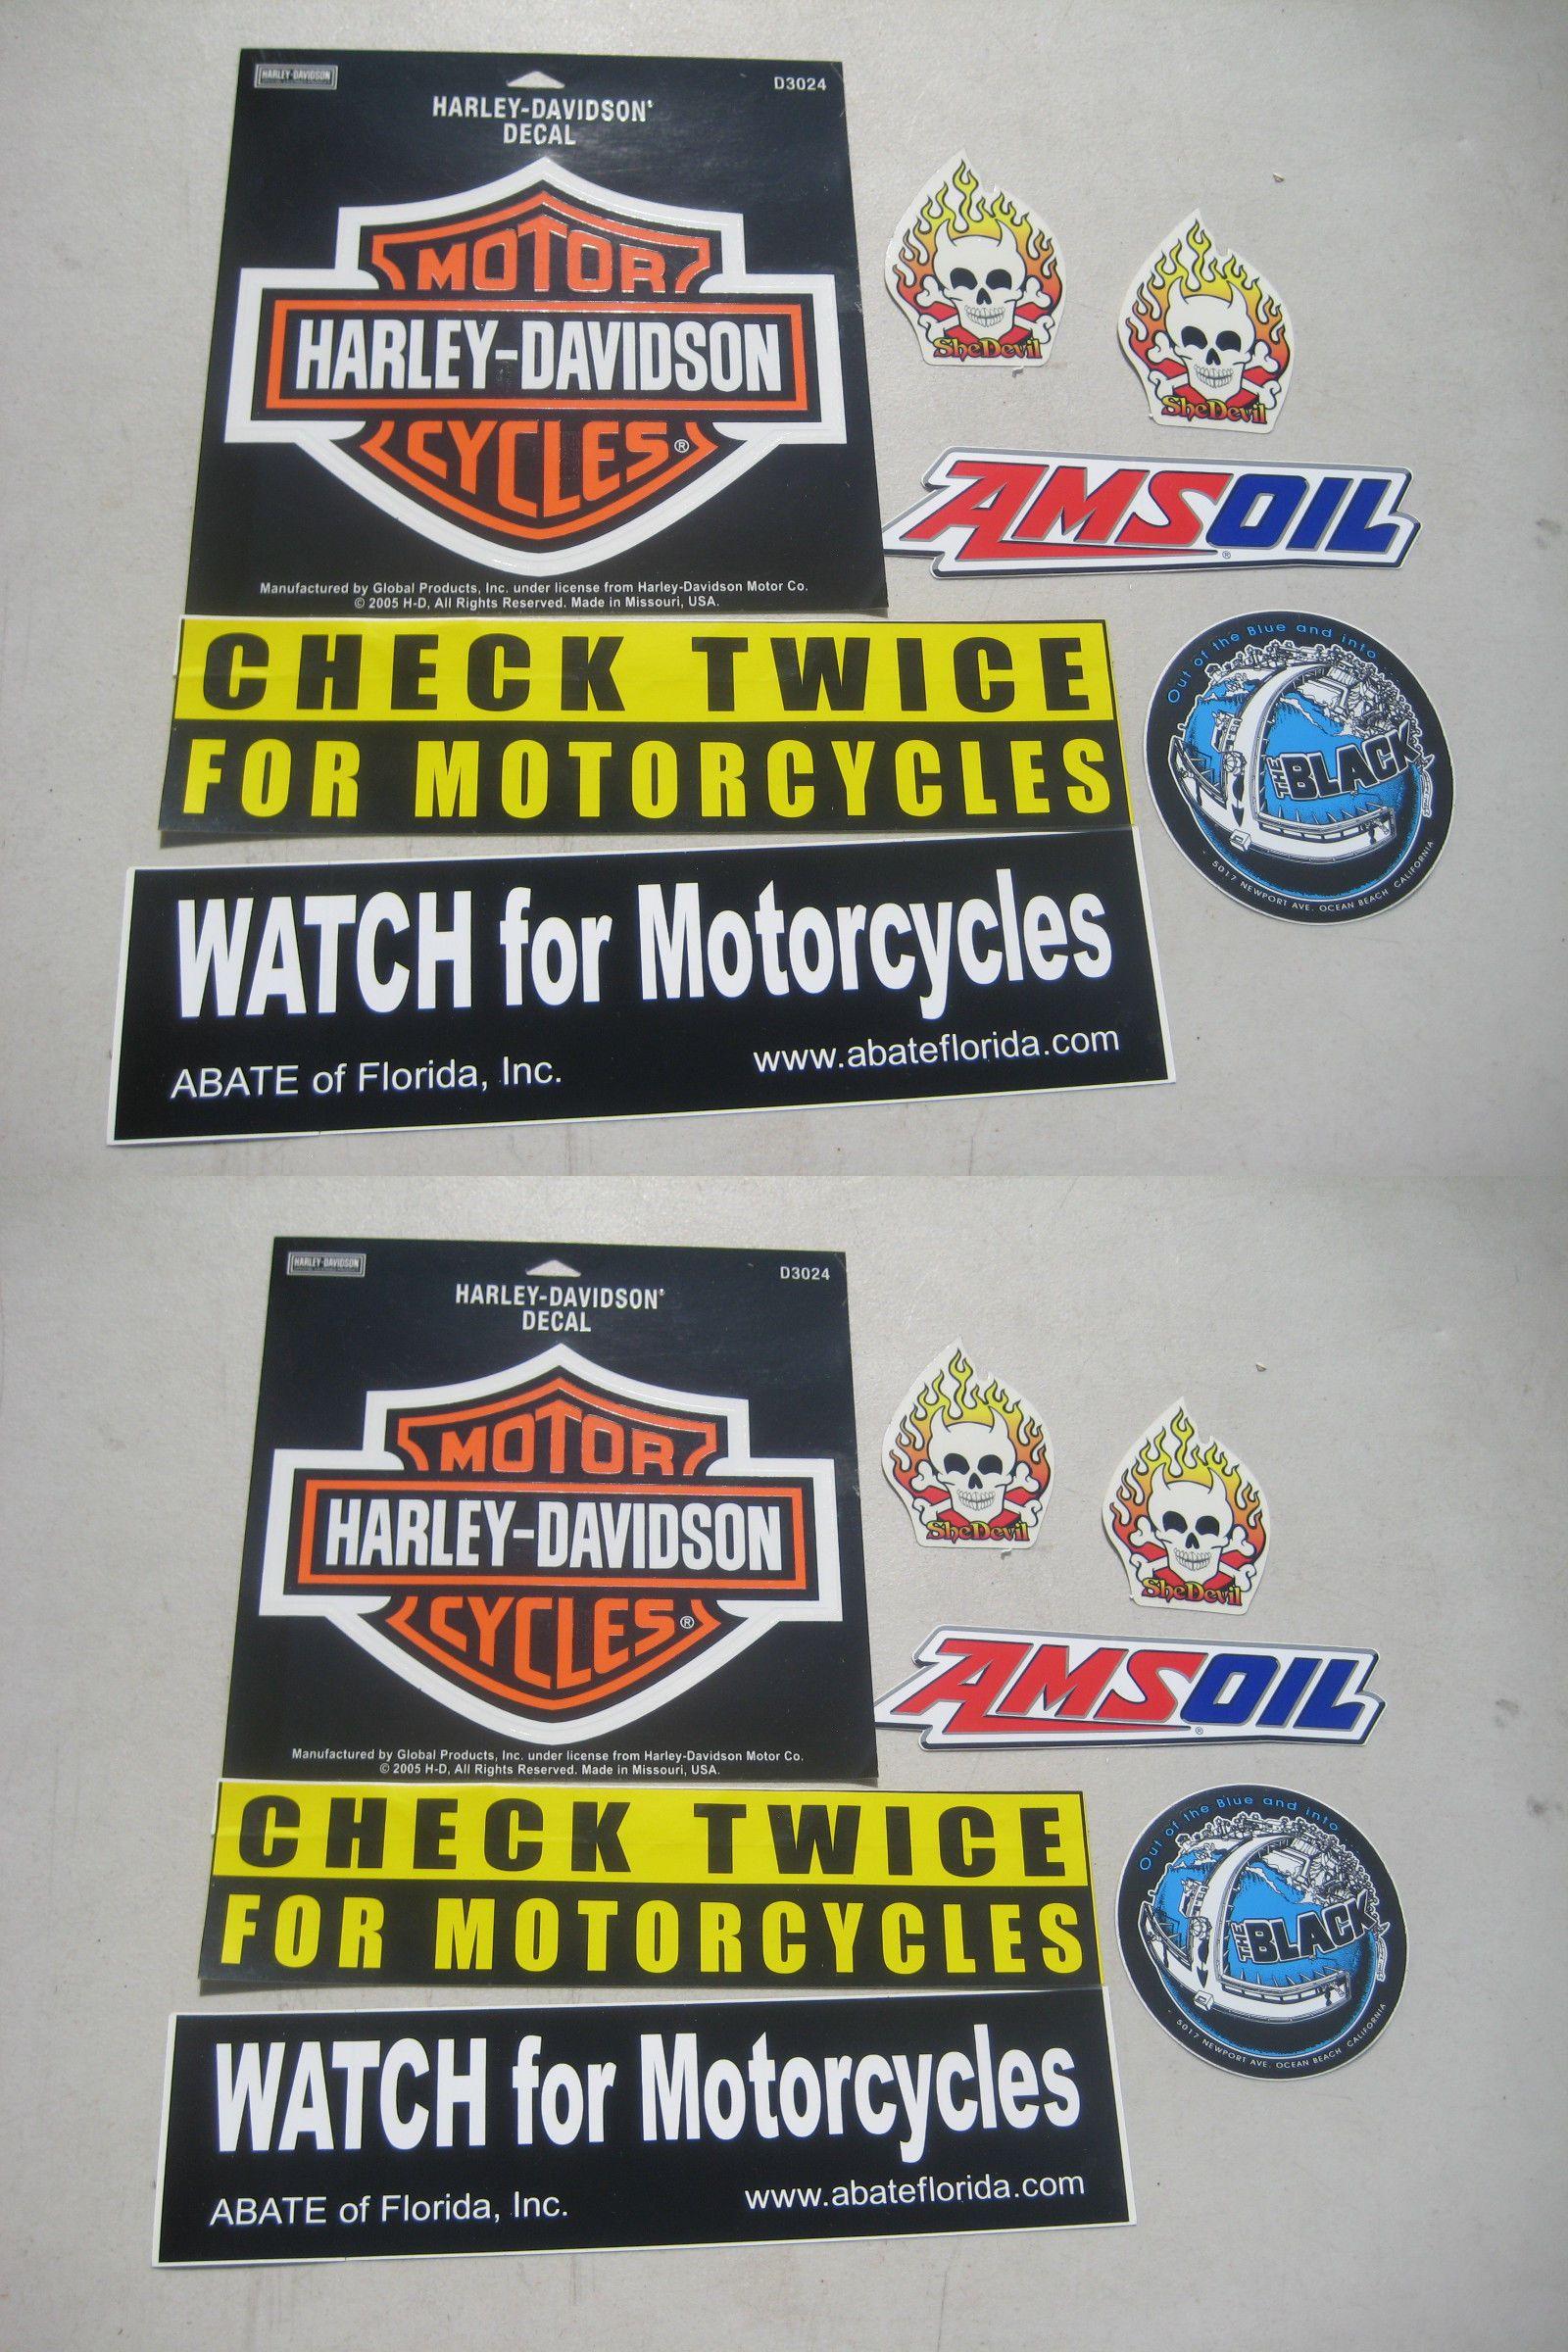 Motorcycles Harley Davidson Motorcycle Stickers Decals Lot - Harley davidsons motorcycles stickers